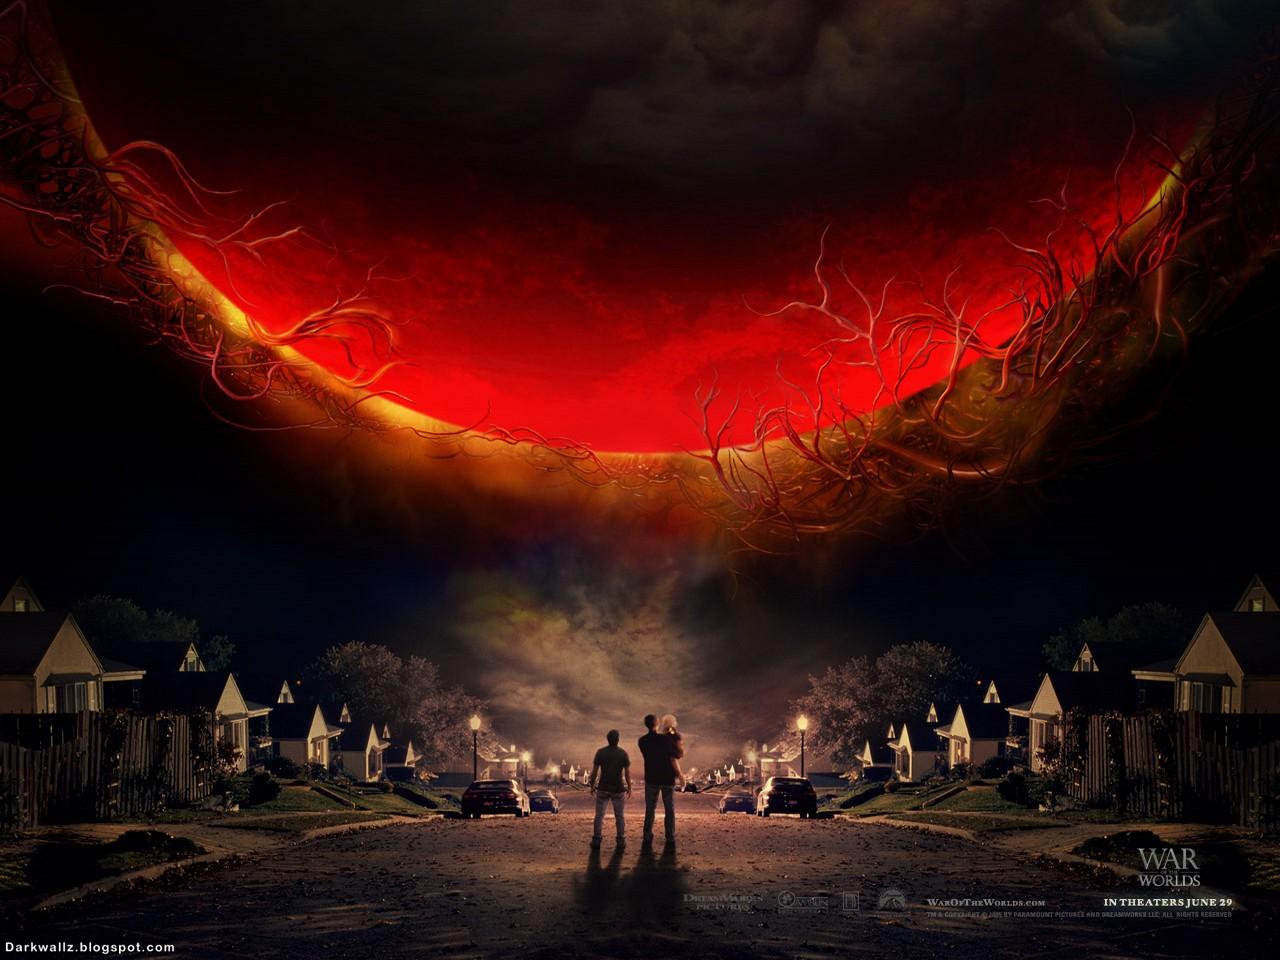 http://4.bp.blogspot.com/_-jo2ZCYhKaY/S4vtIZLtqGI/AAAAAAAAG4M/LUyMGR2sXZE/s1600/Creepy_Movies_Wallpapers_22%2B(darkwallz.blogspot.com).jpg